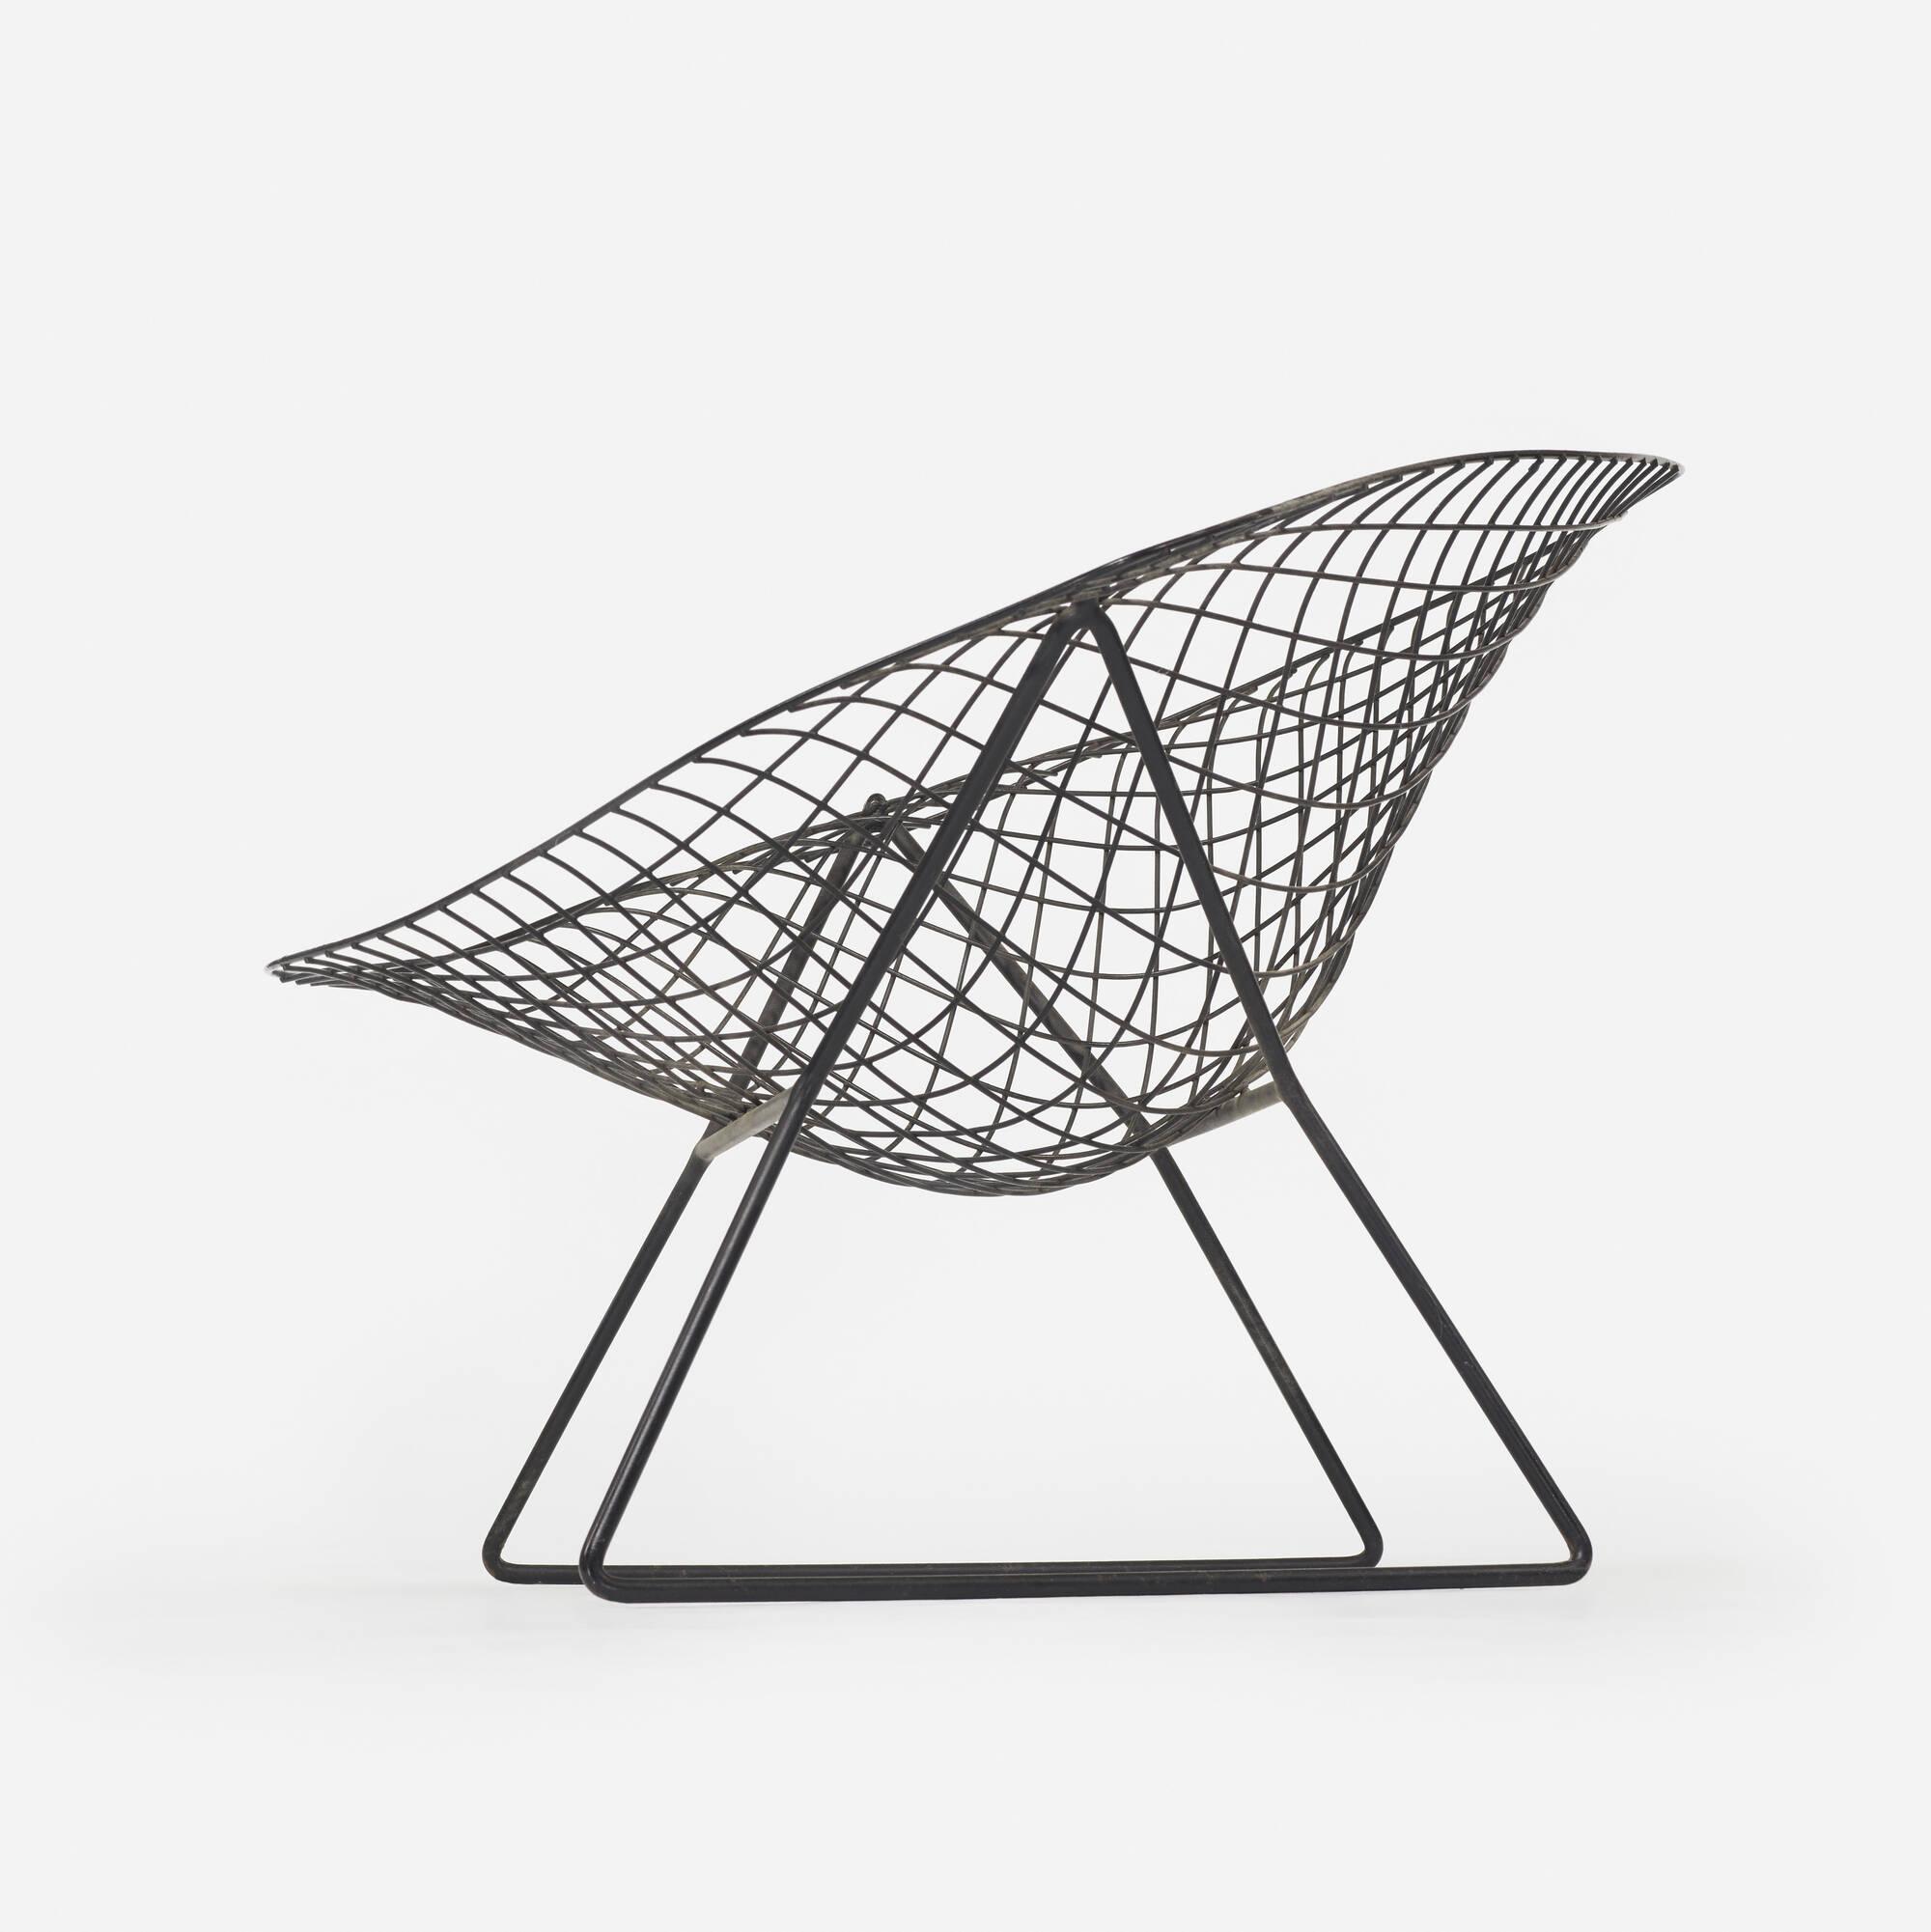 139 harry bertoia prototype diamond chair 4 of 5